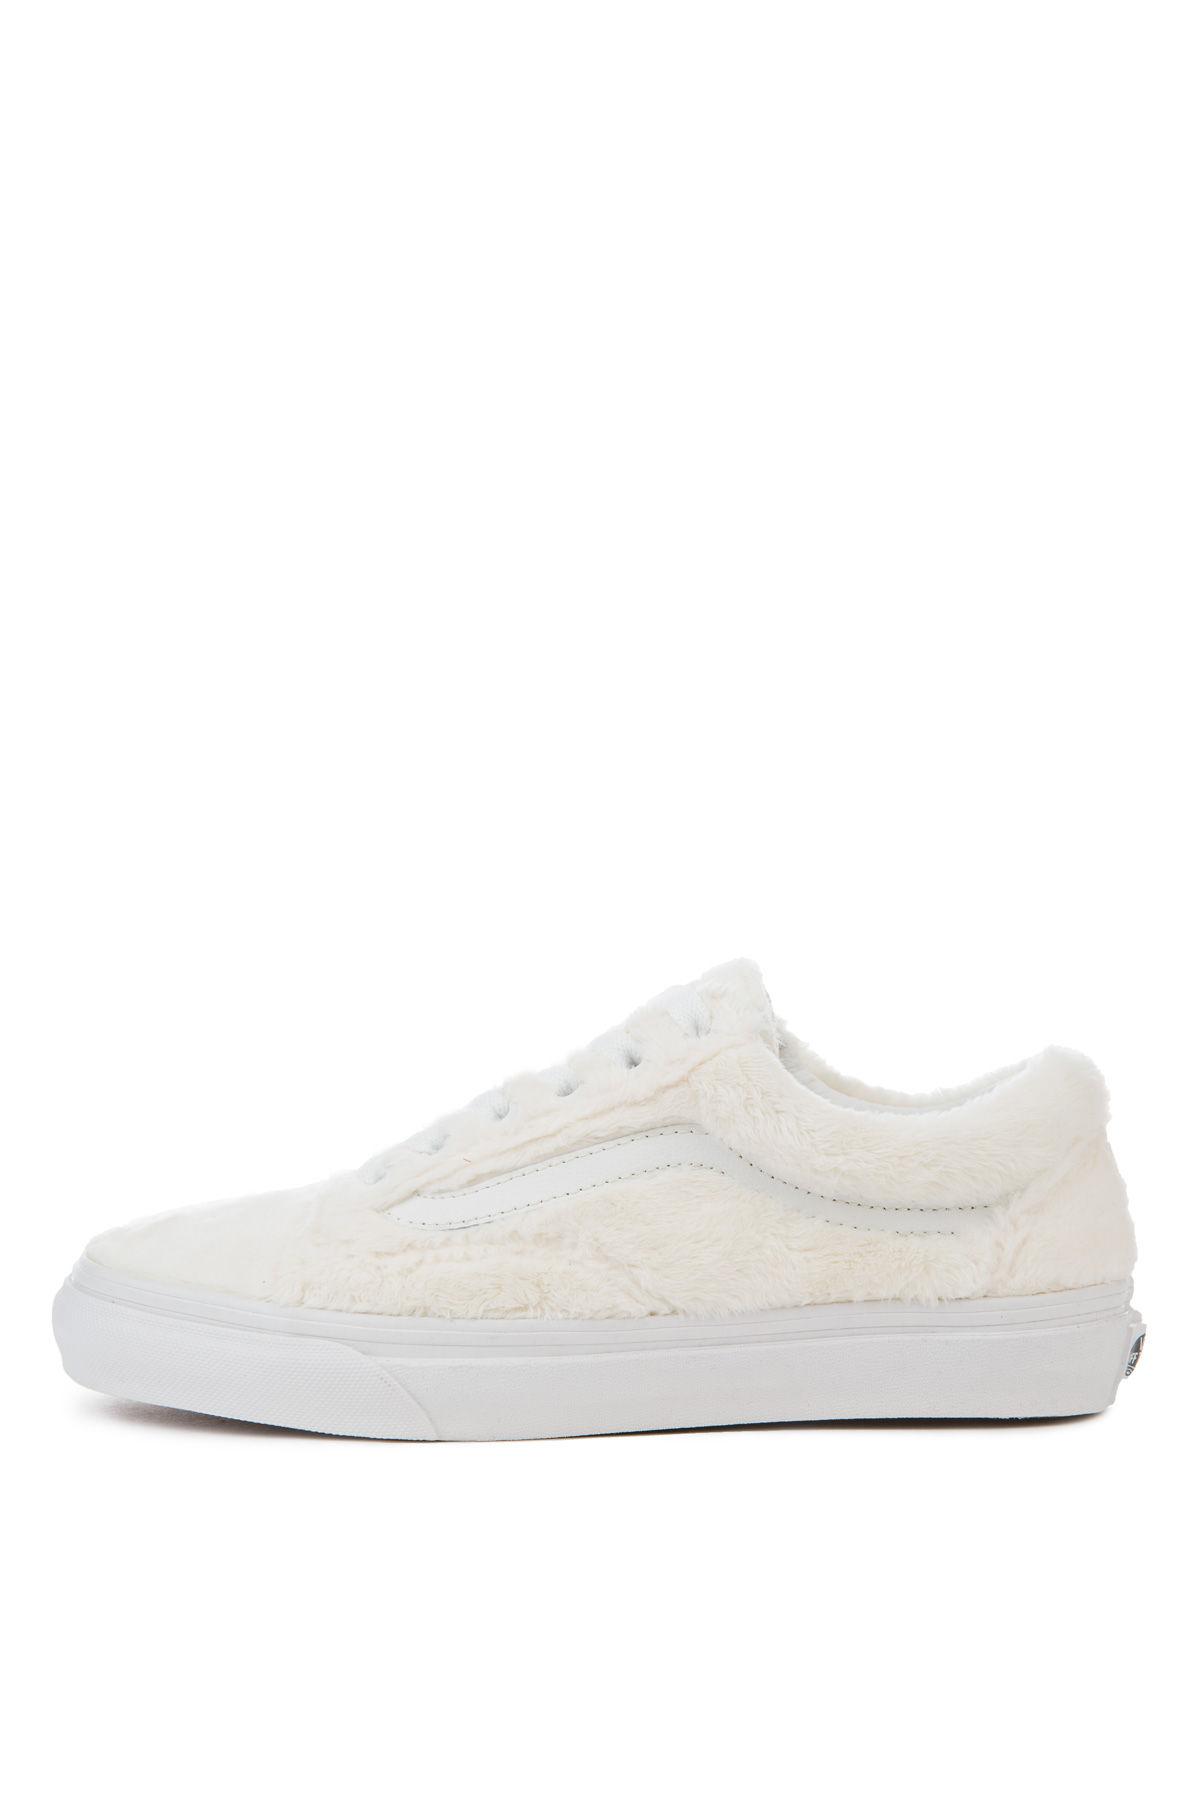 8cbb0aa027e Vans Sneaker Women s Old Skool Sherpa Turtledove True White